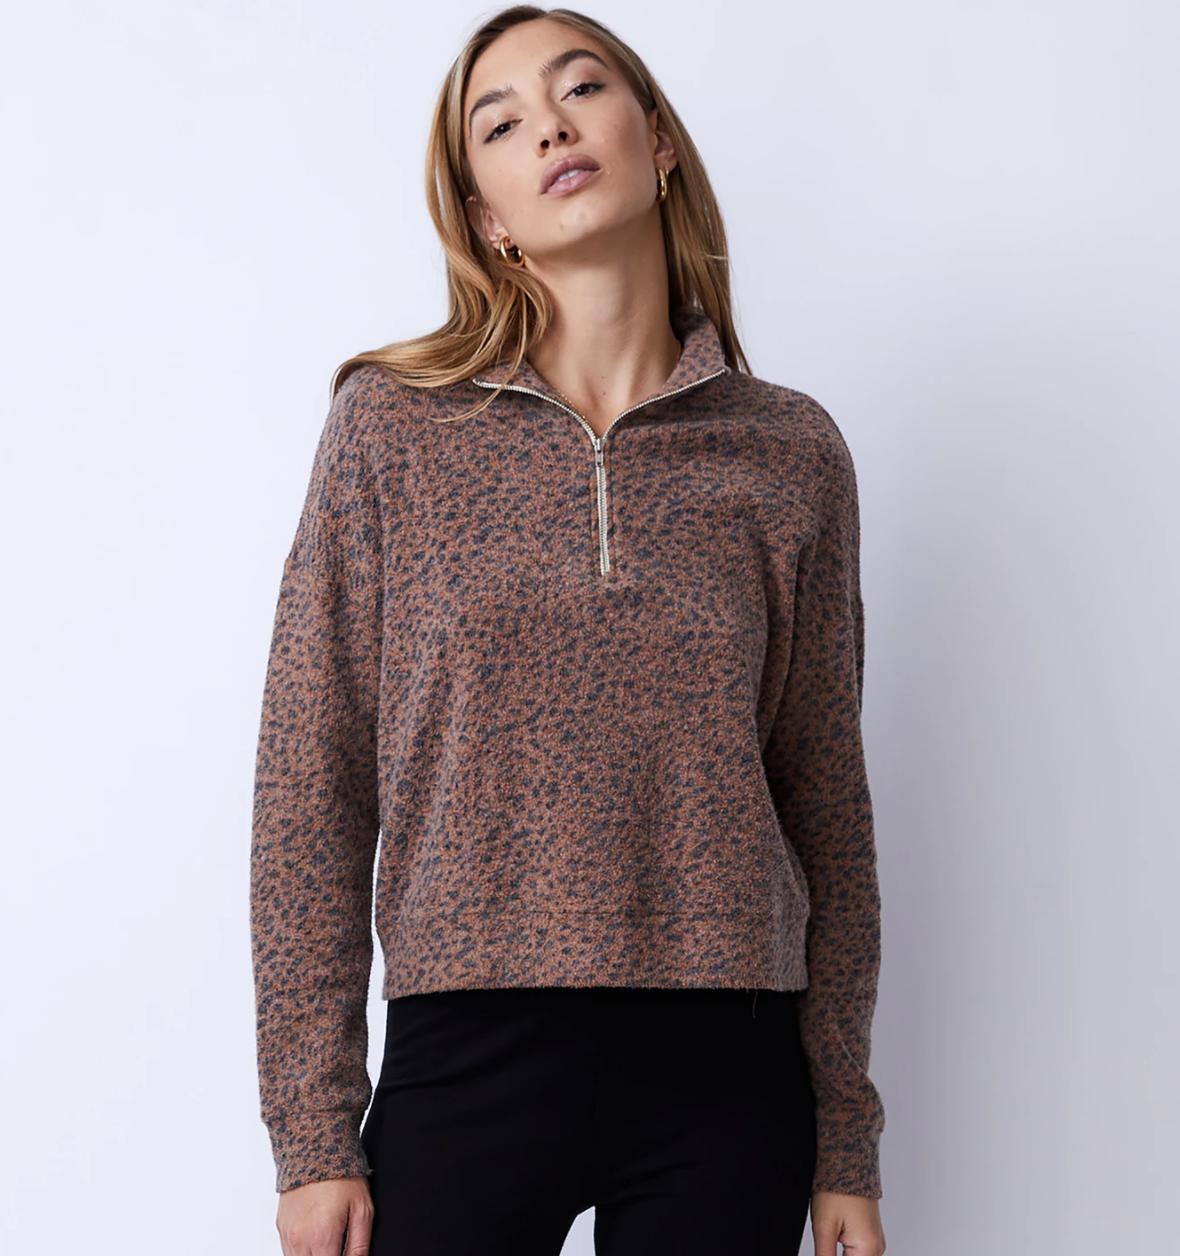 Mini Leopard Half-Zip Pullover